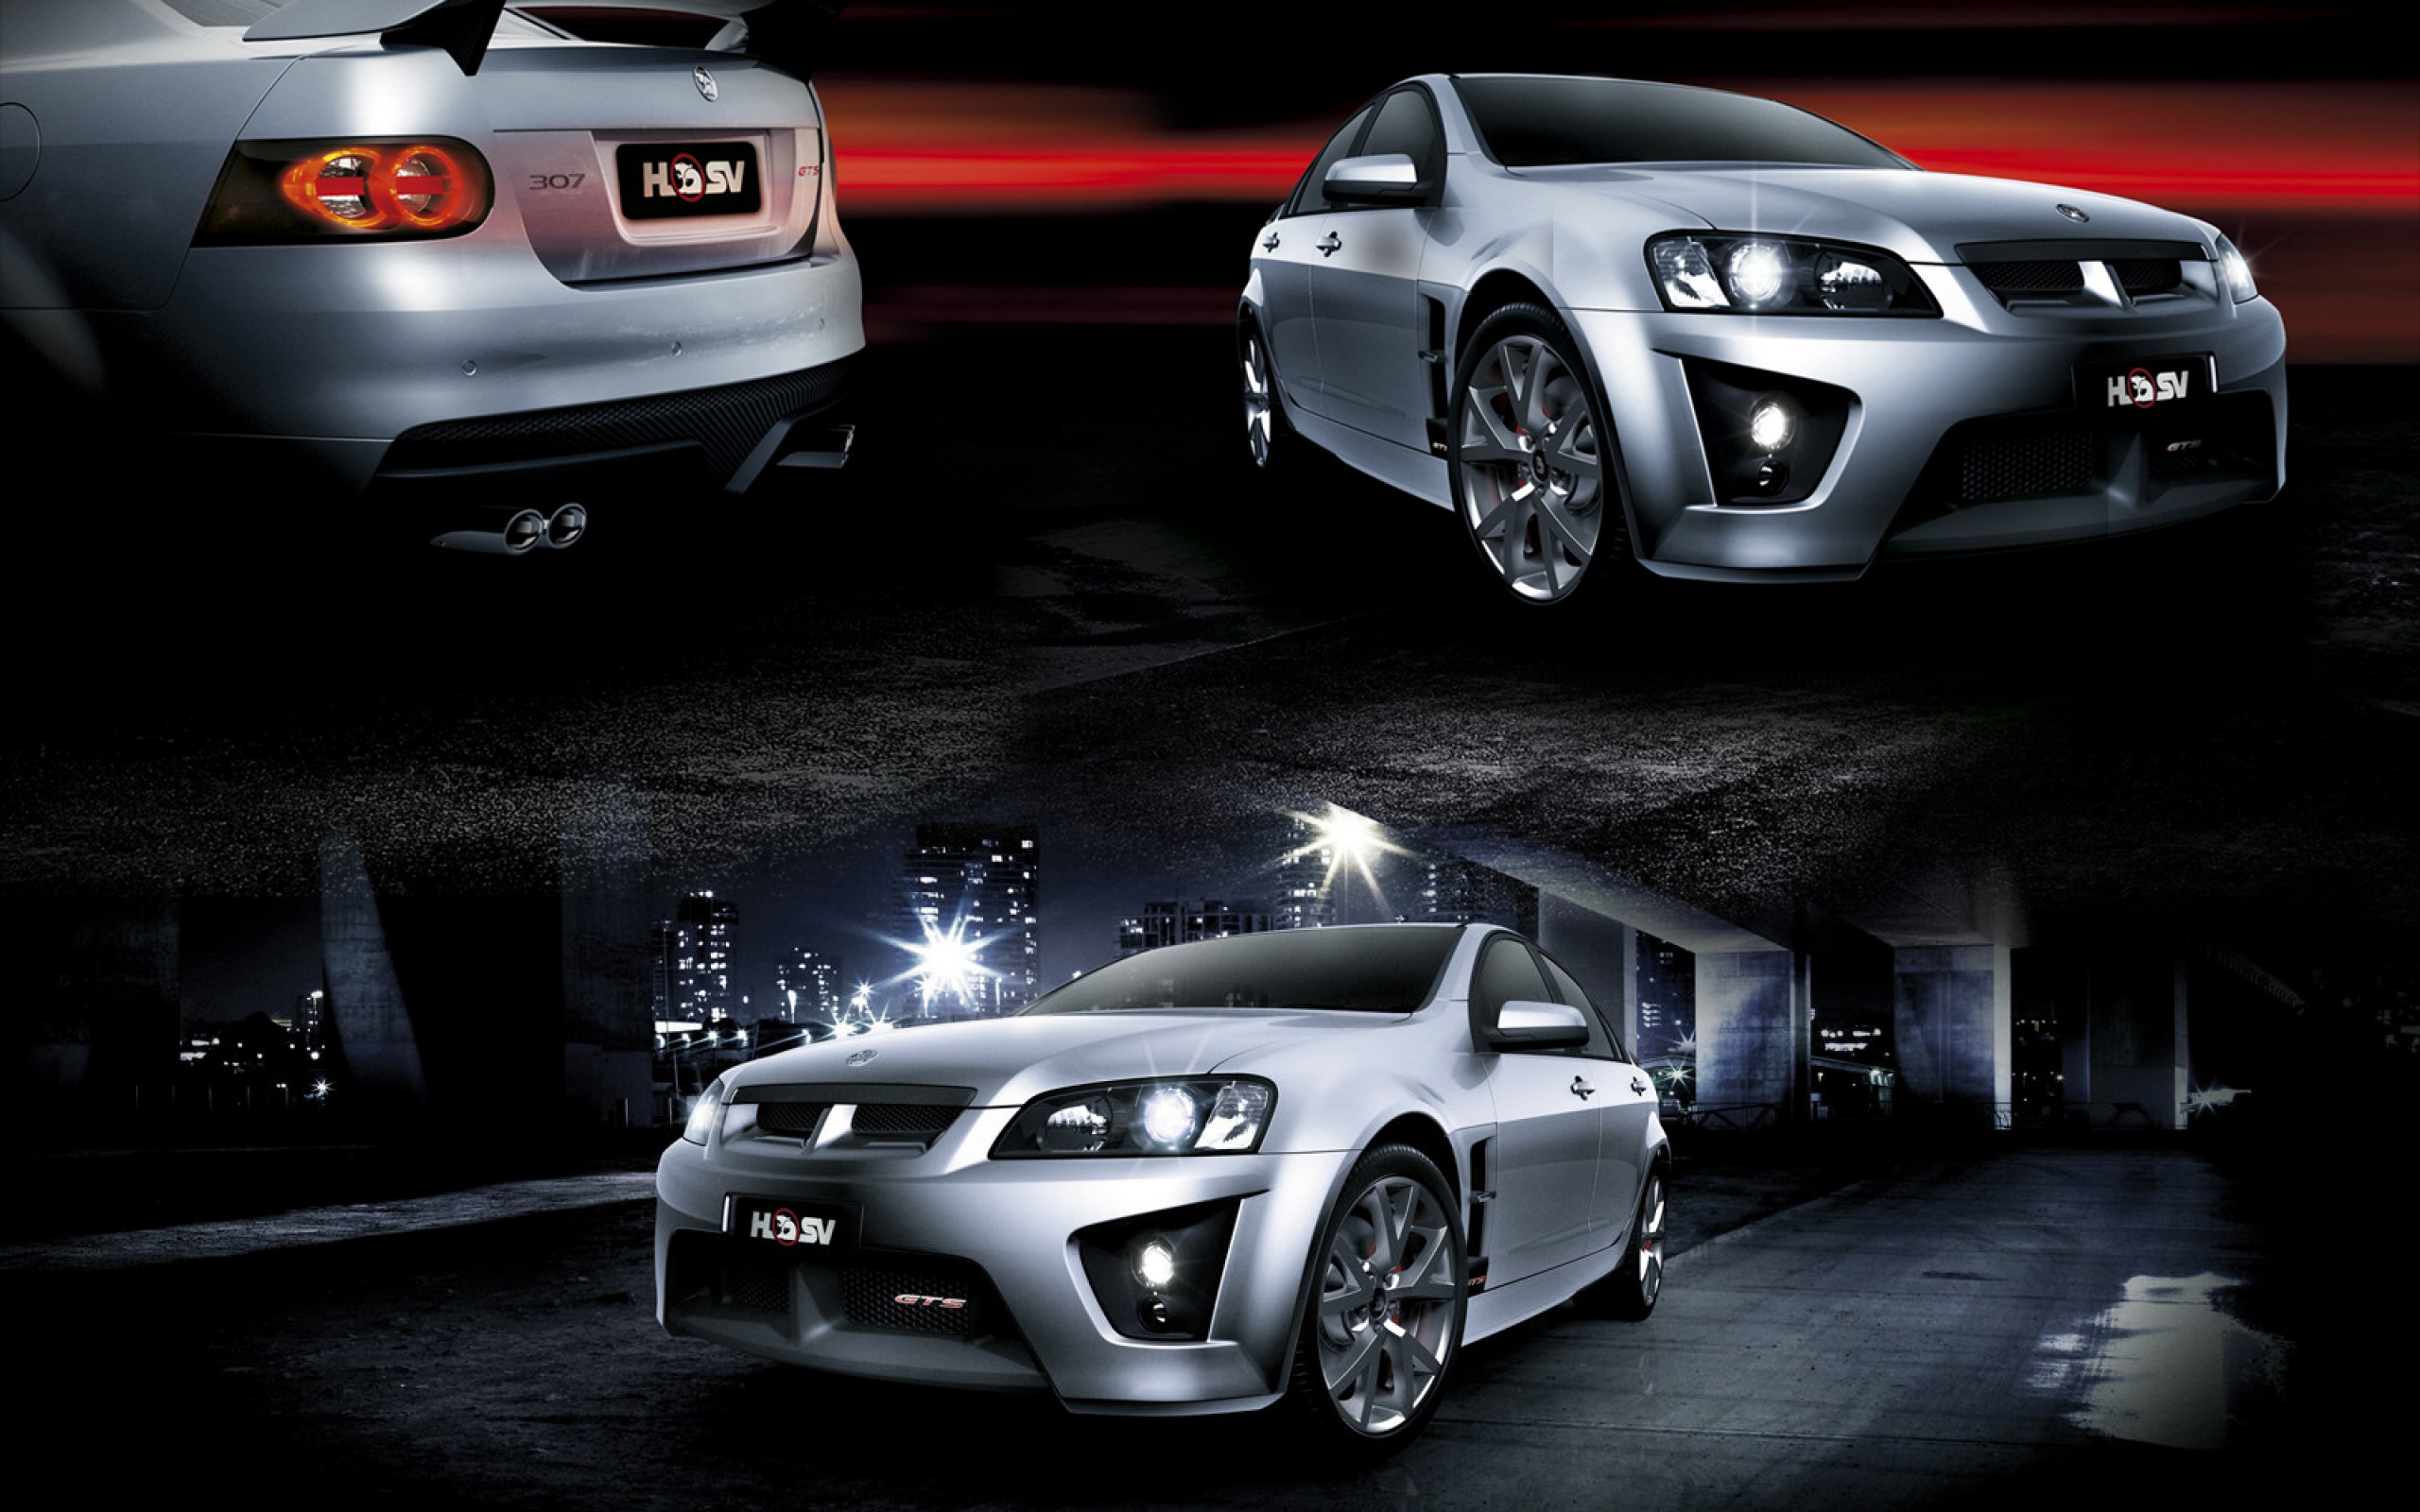 Car Wallpapers Reddit Holden Hsv Gts Hd Wallpaper Background Image 2560x1600